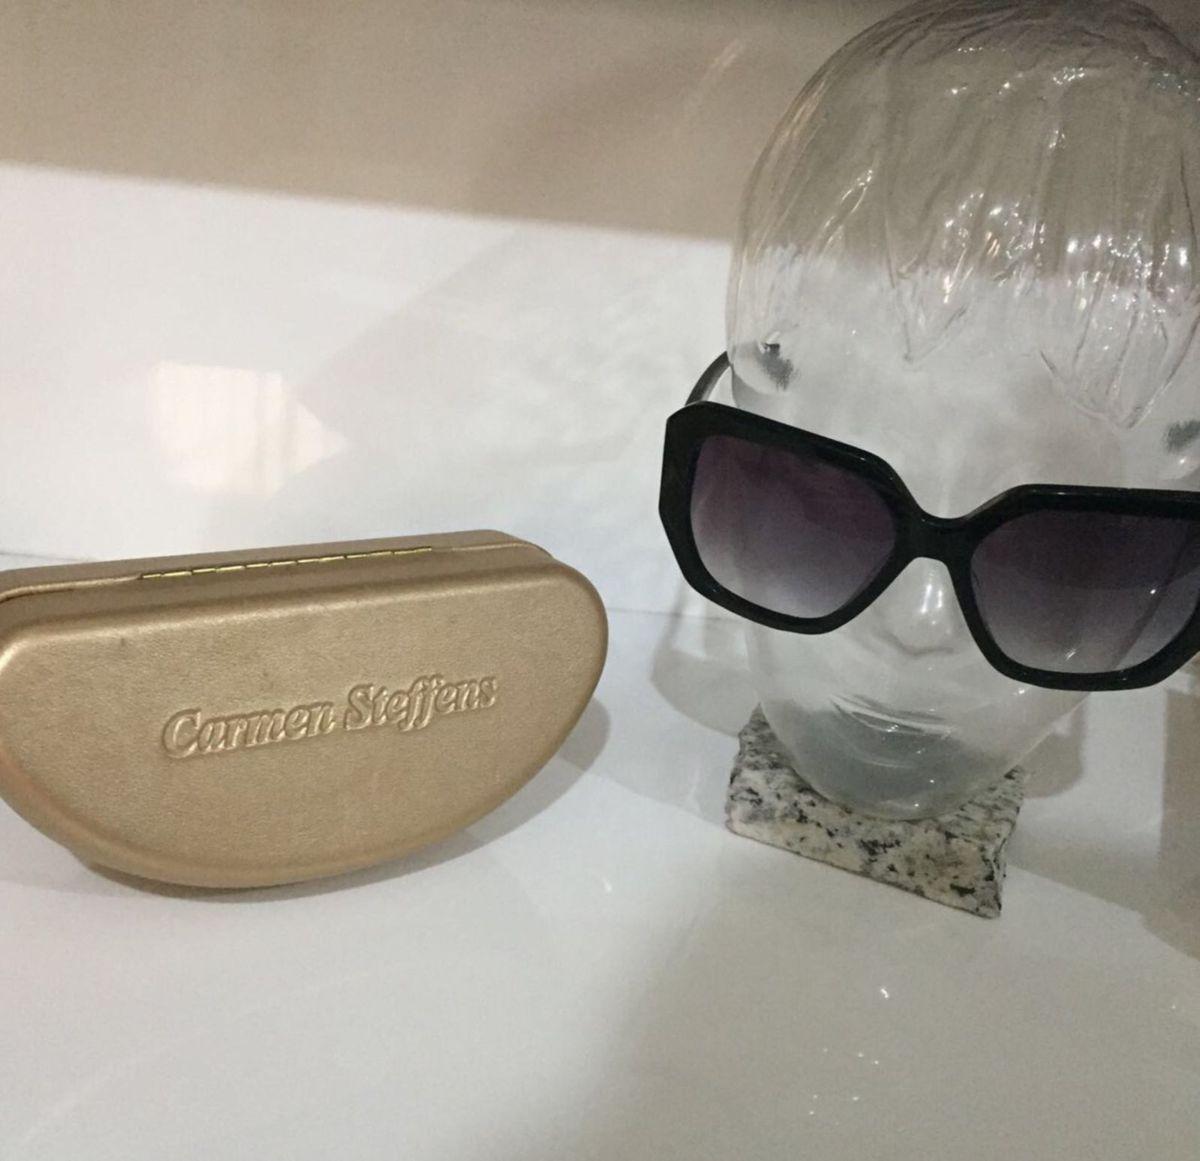 cca6bf46199d2 óculos de sol original - óculos carmen steffens.  Czm6ly9wag90b3muzw5qb2vplmnvbs5ici9wcm9kdwn0cy83mdq3mzeyl2jloda0mjizyta2njq0zwuxzda2ntzmmmvlmdgxmgfklmpwzw  ...